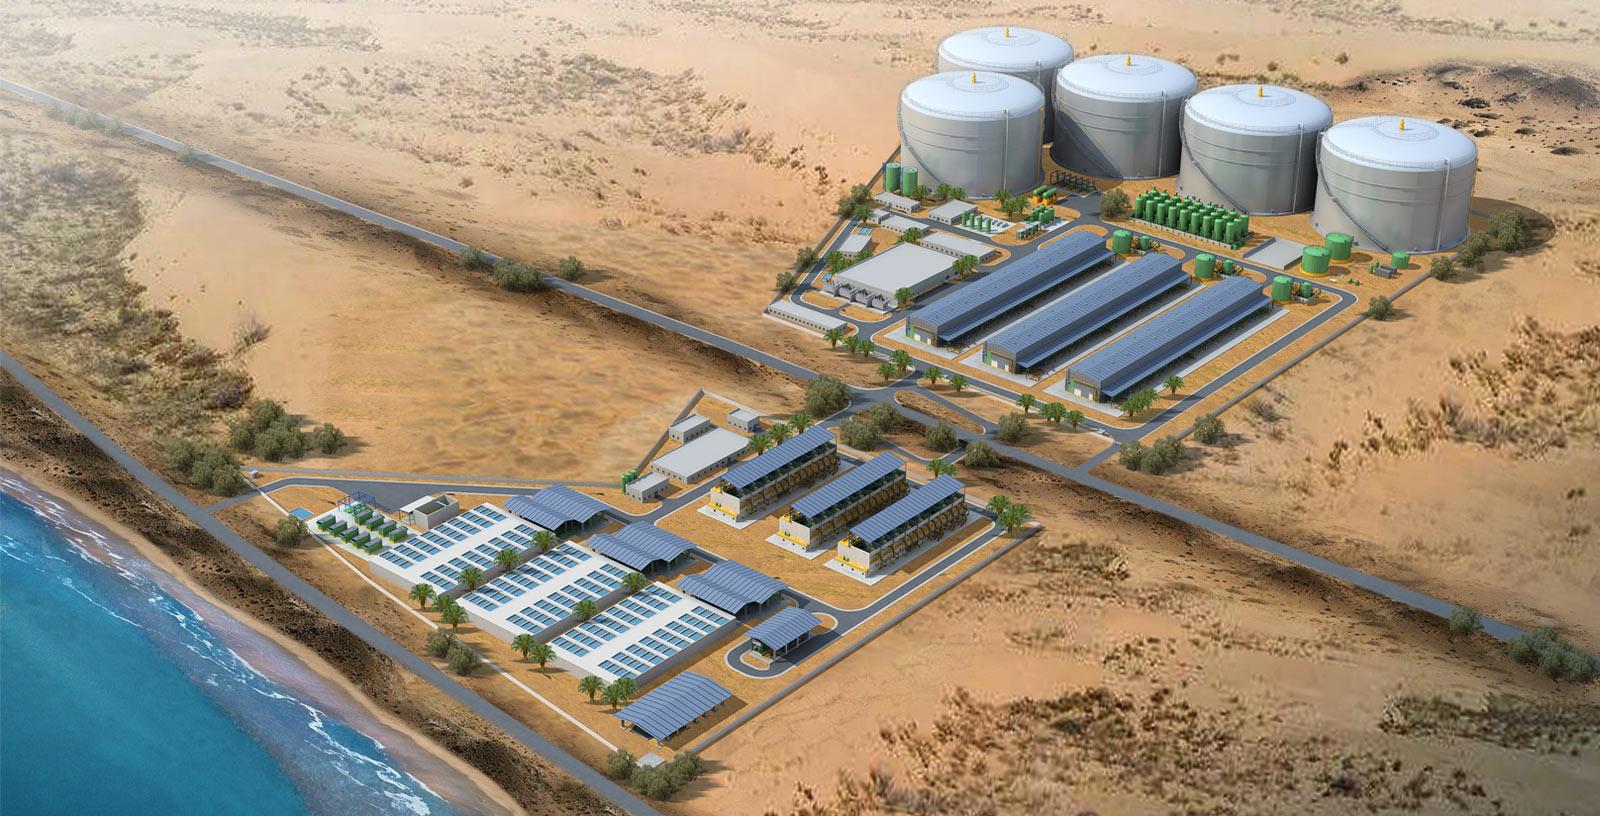 Umm_Al_Quwain_Seawater_Reverse_Osmosis_Desalination_Plant_UAE_ZIPDE_IDOM